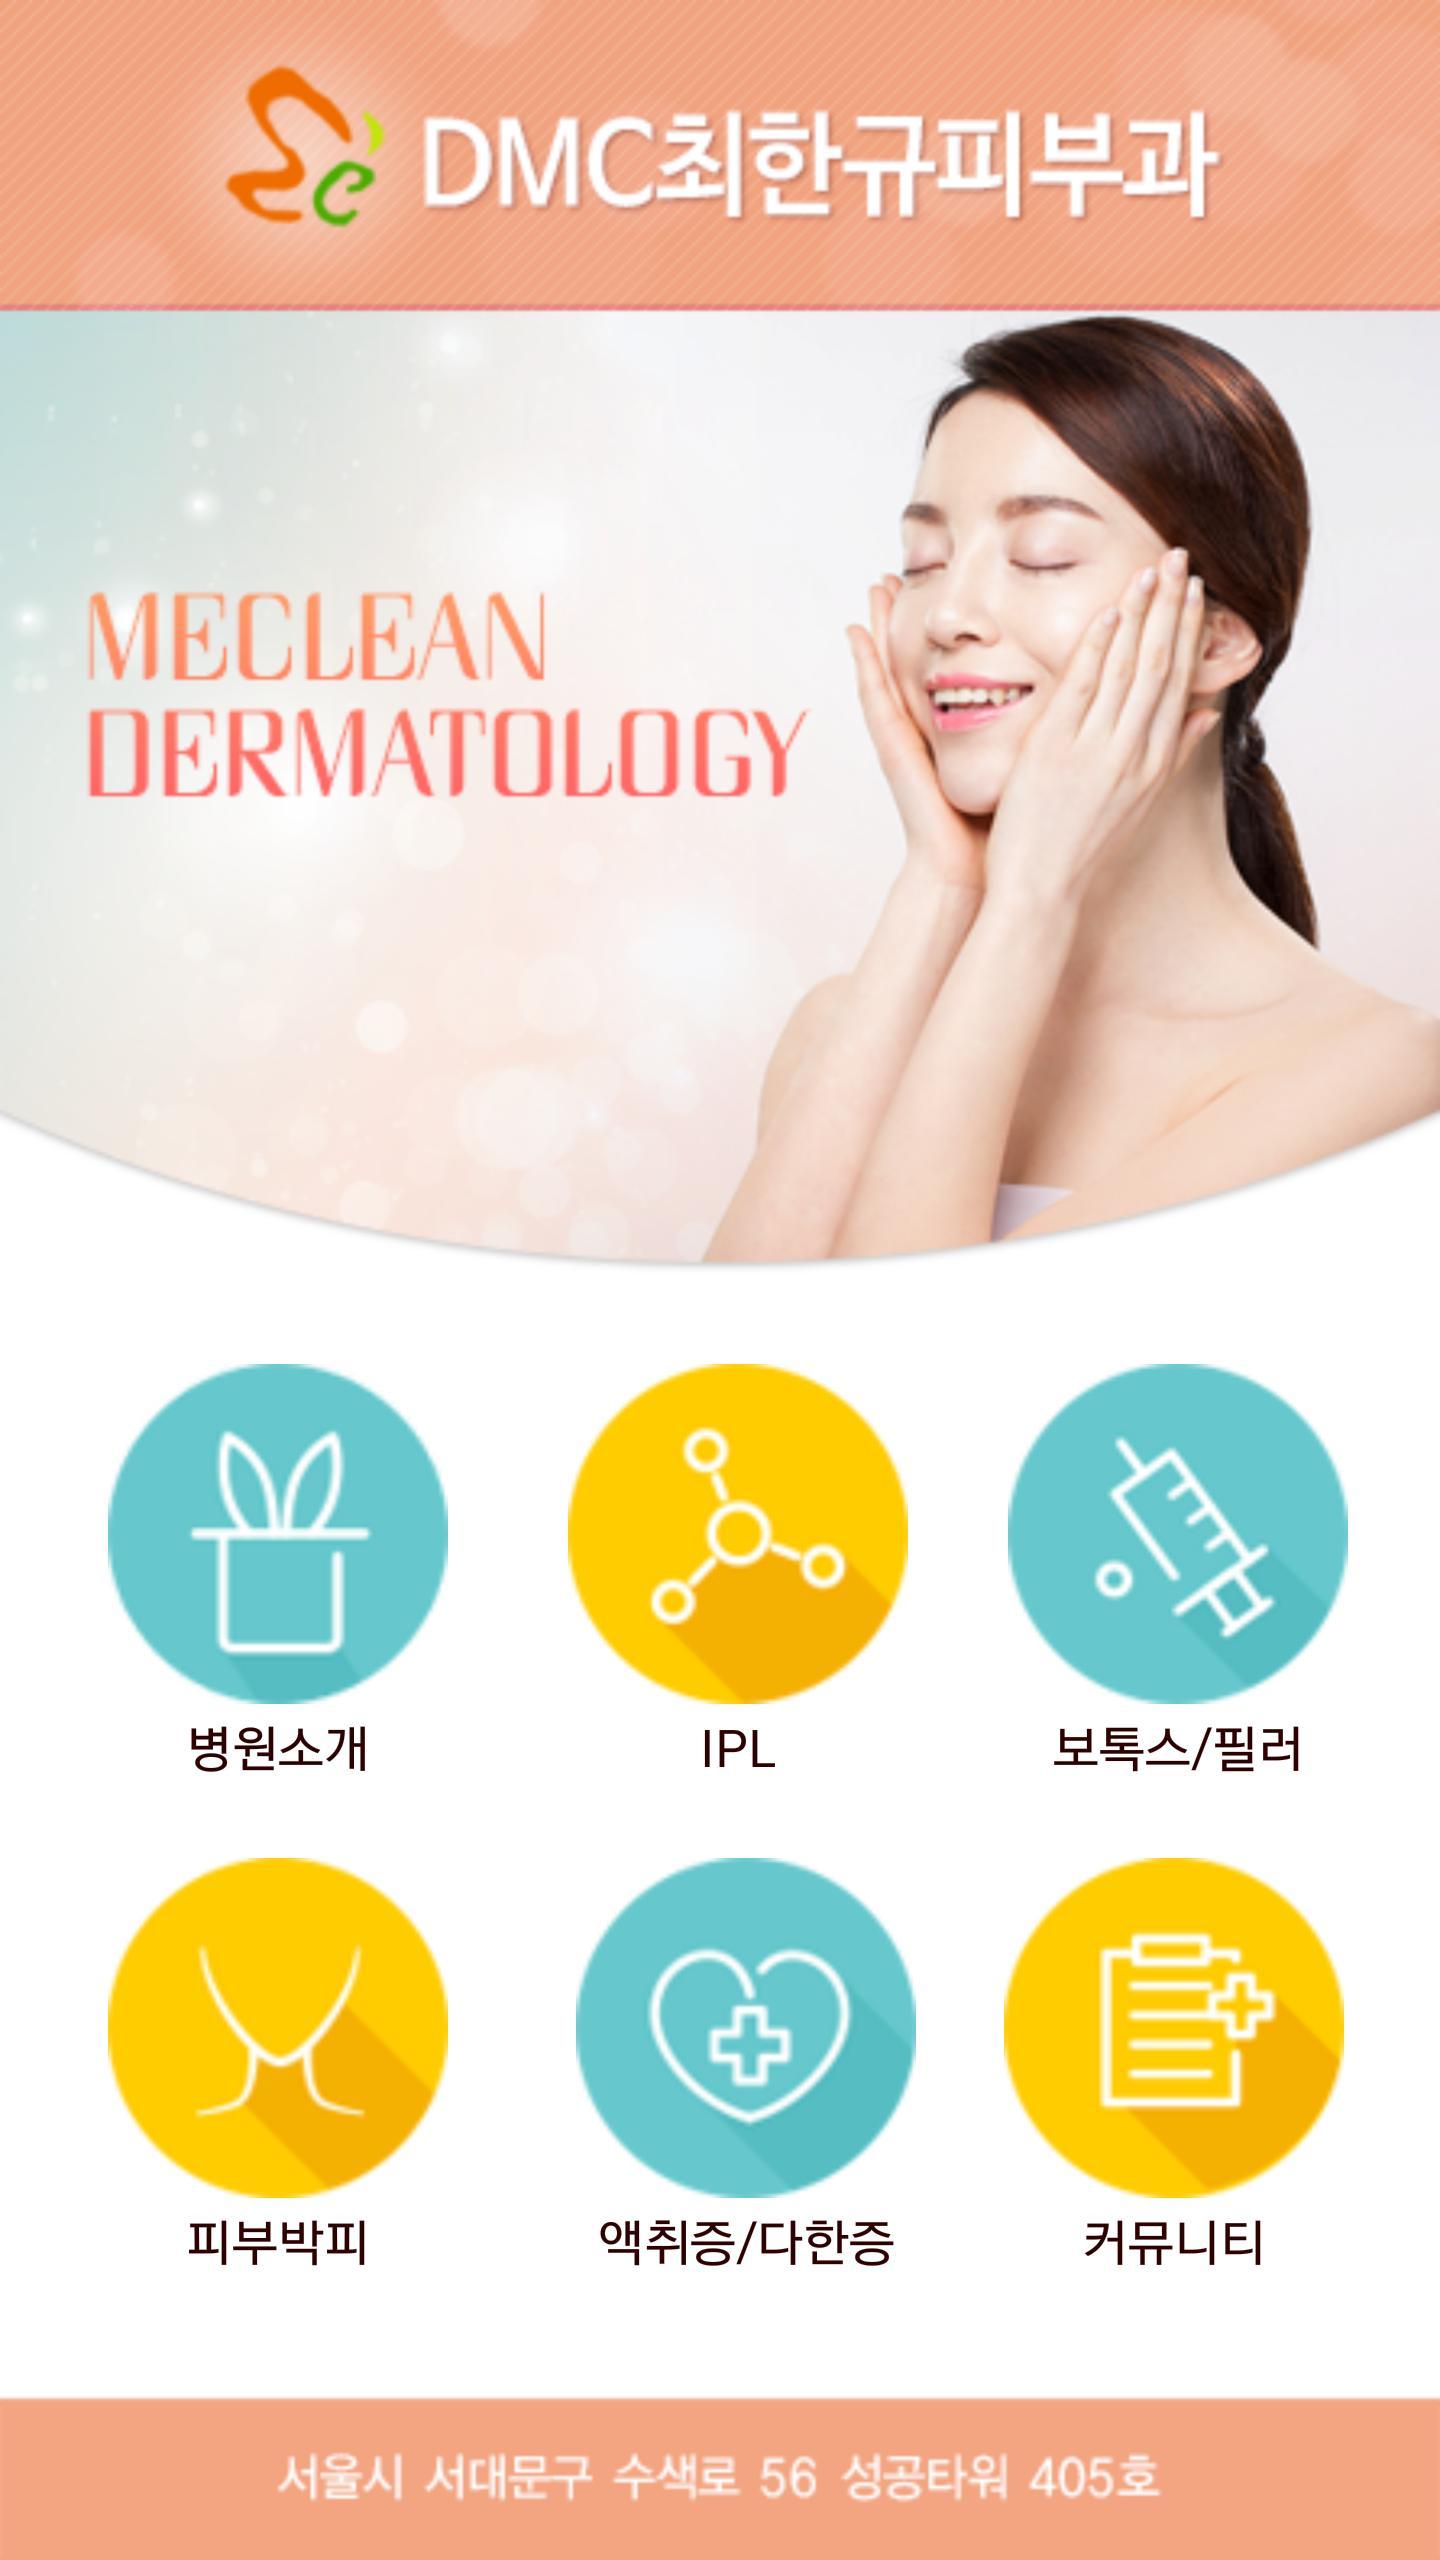 DMC최한규 피부과 (병원 견본앱) for Android - APK Download